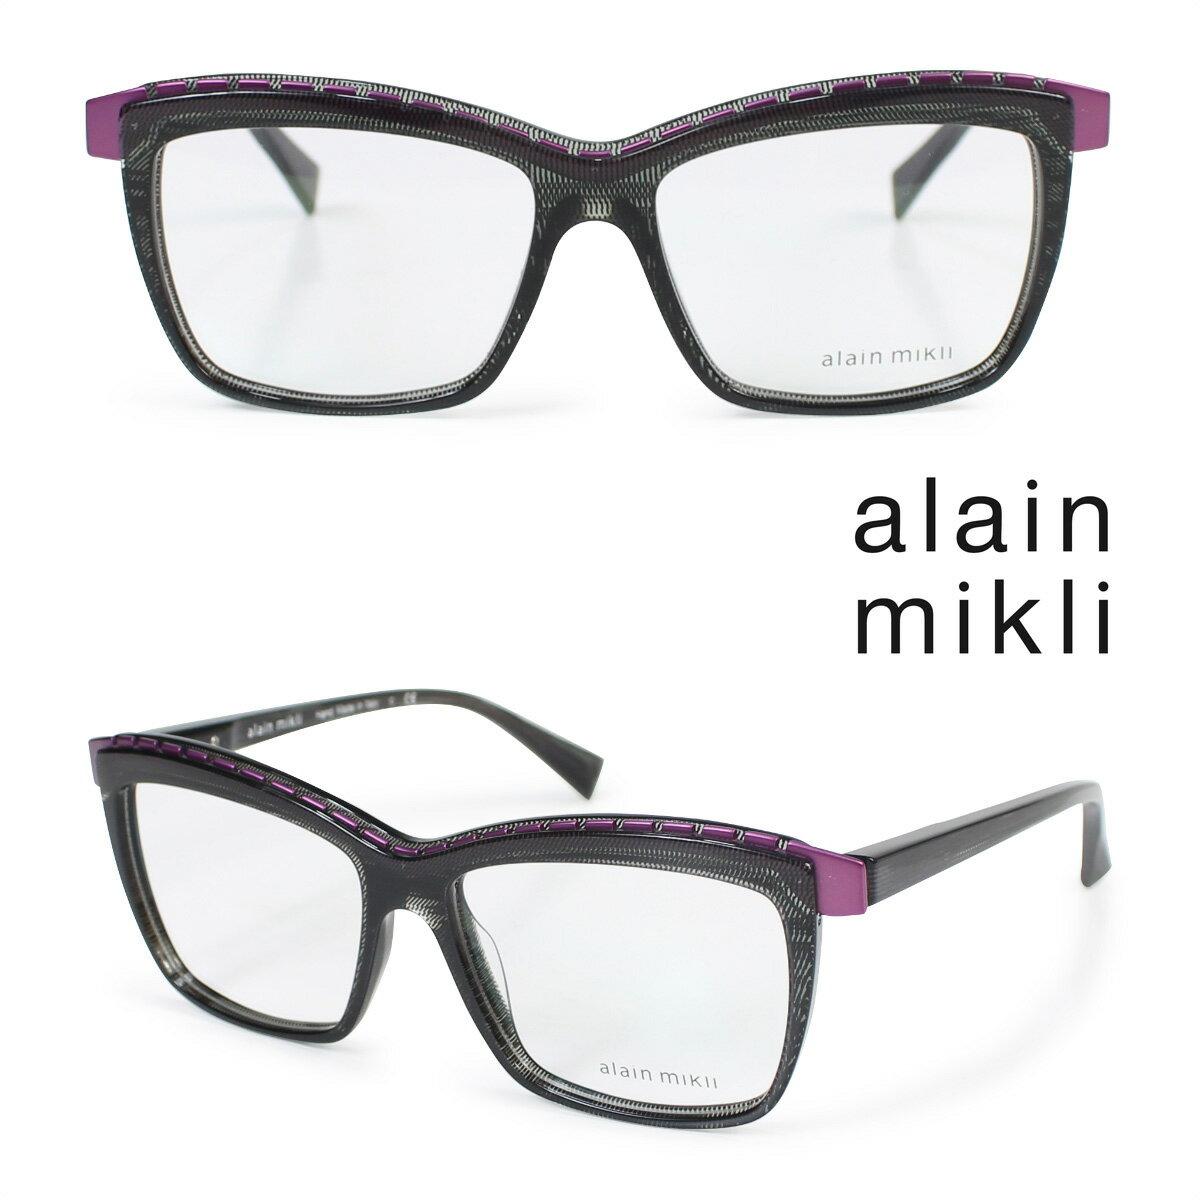 alain mikli アランミクリ メガネ メガネフレーム 眼鏡 フランス製 メンズ レディース [179]